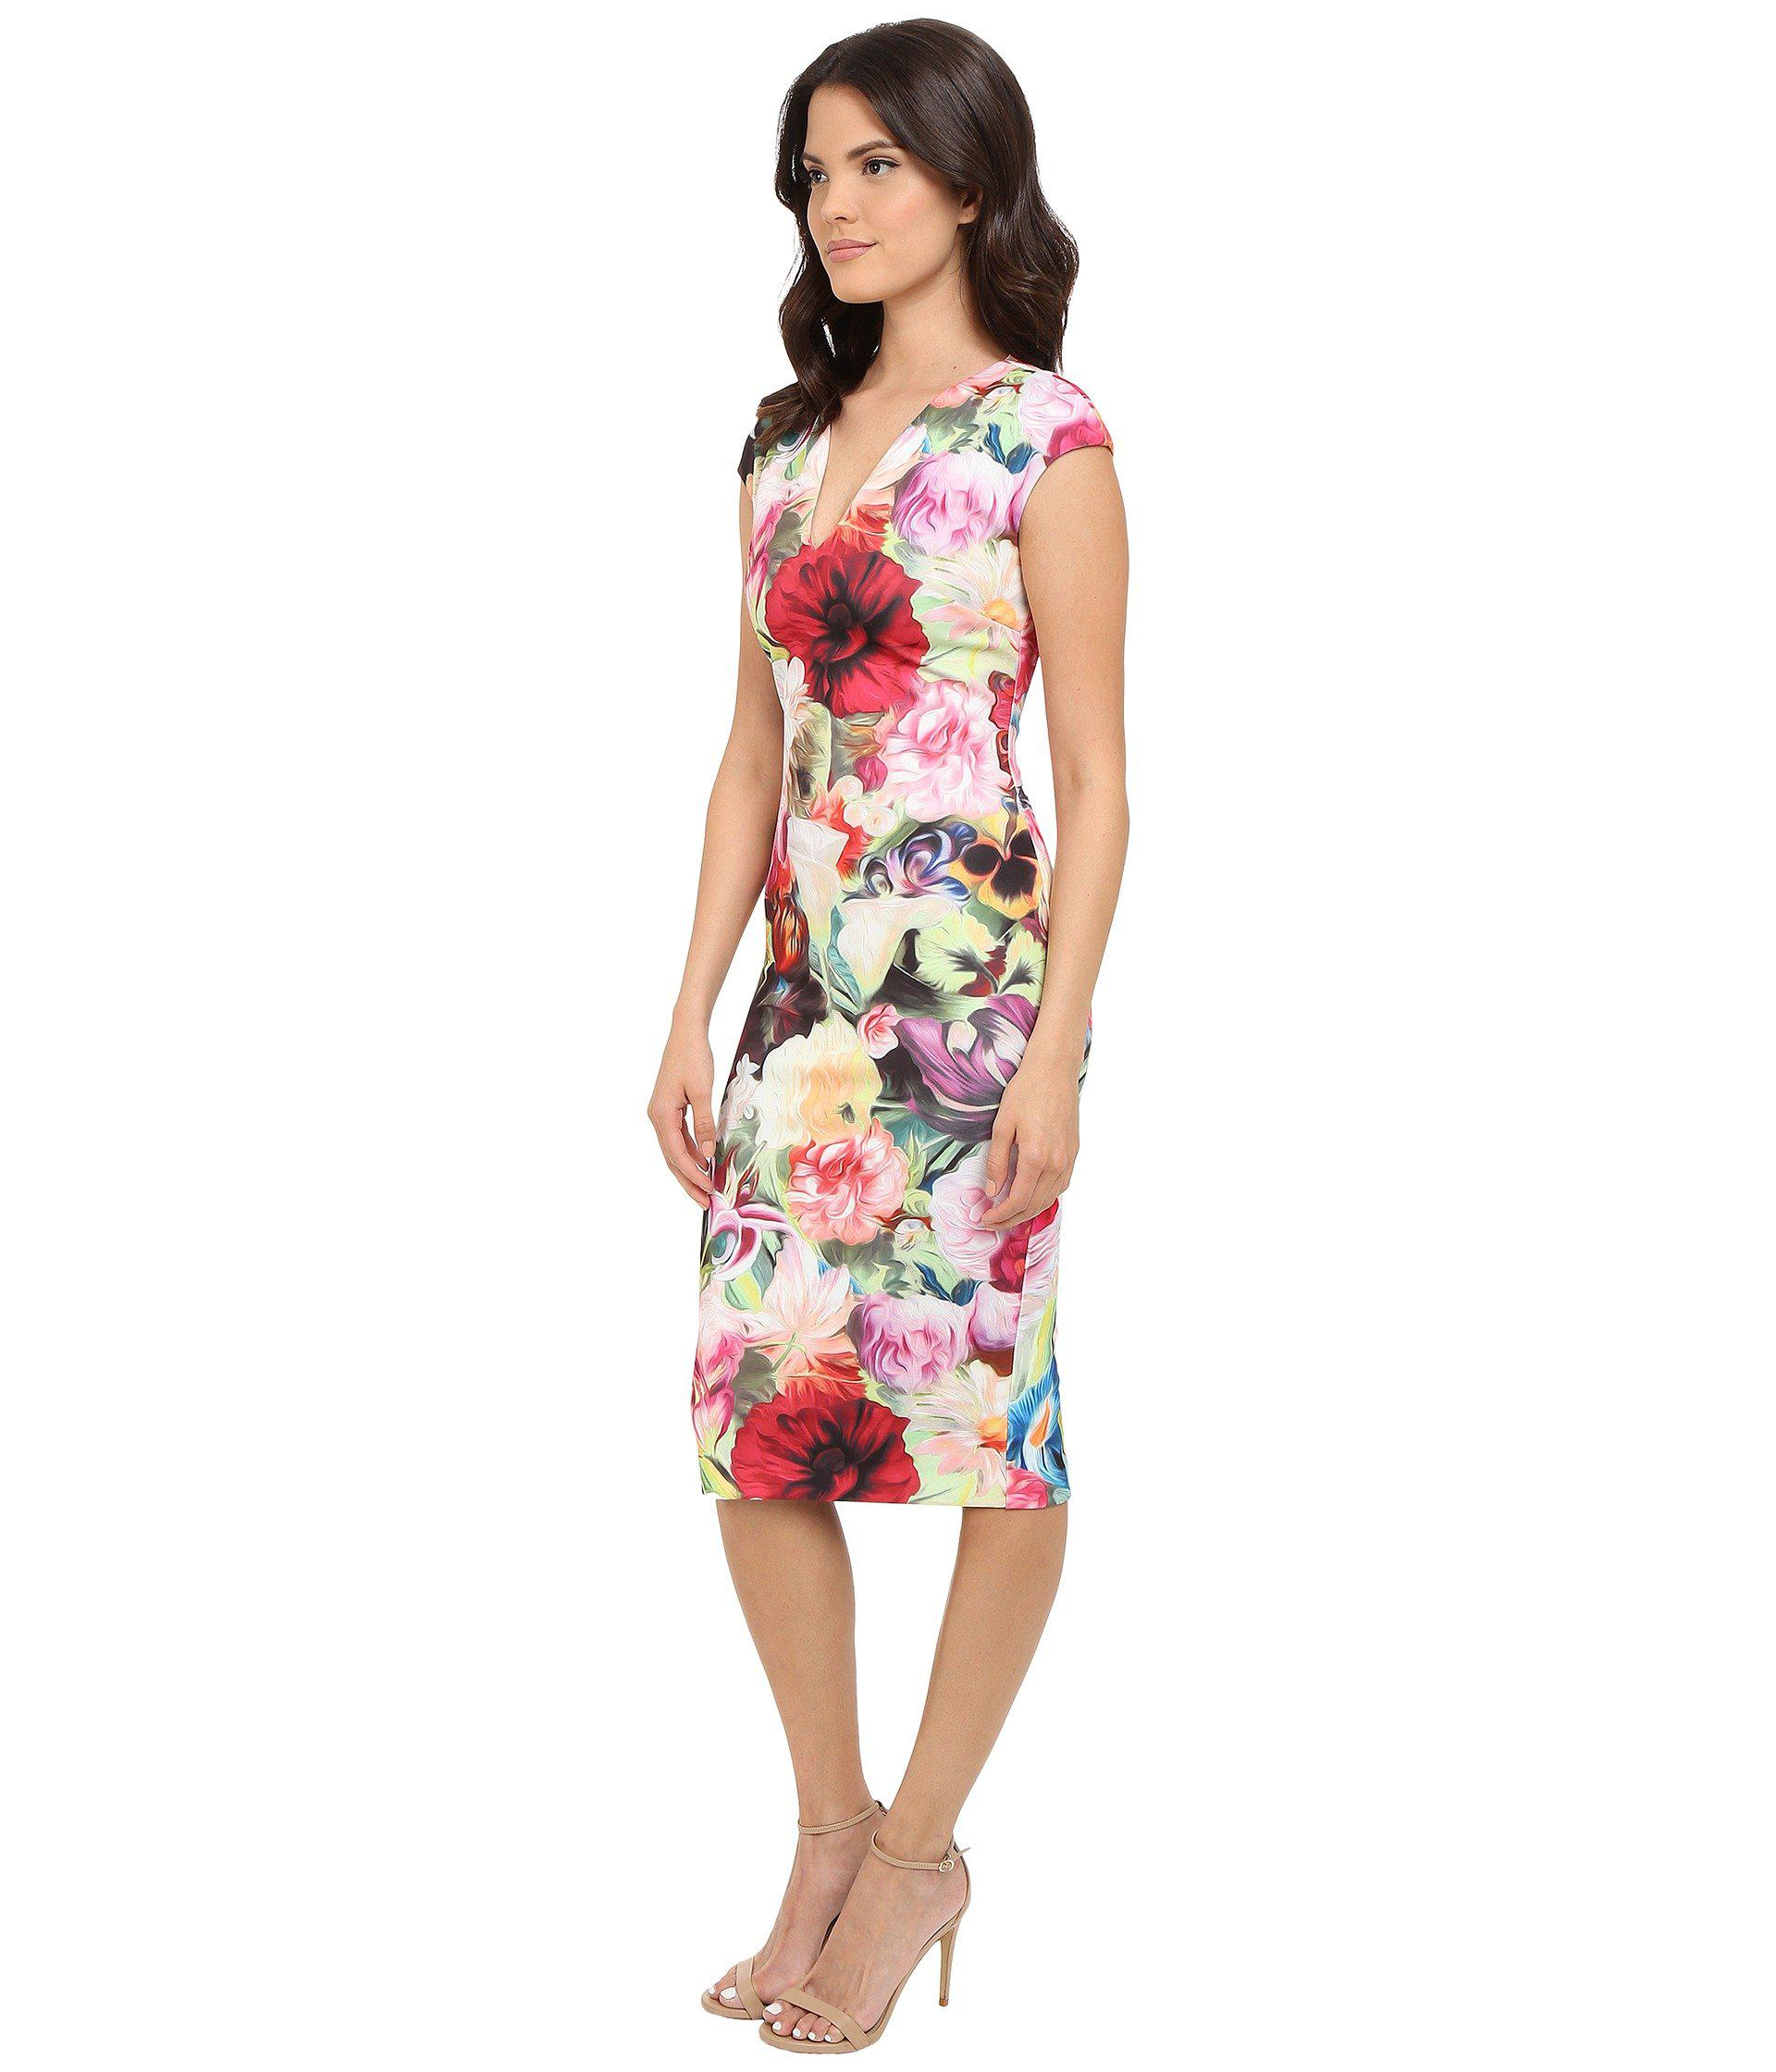 6cb29cc837dd0 Lyst - Ted Baker Odeela Floral Swirl Print Dress in Red